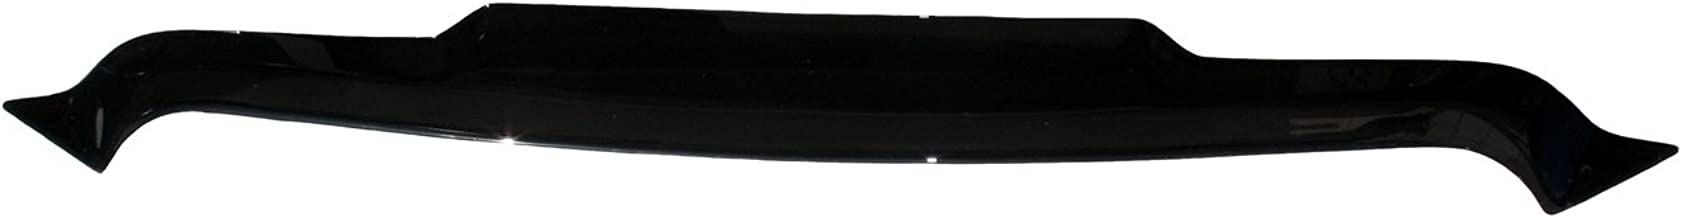 Auto Ventshade AVS 322004 Aeroskin Flush Mount Dark Smoke Hood Protector for 2009-2018 Dodge 1500 (Excludes Sport & Rebe...